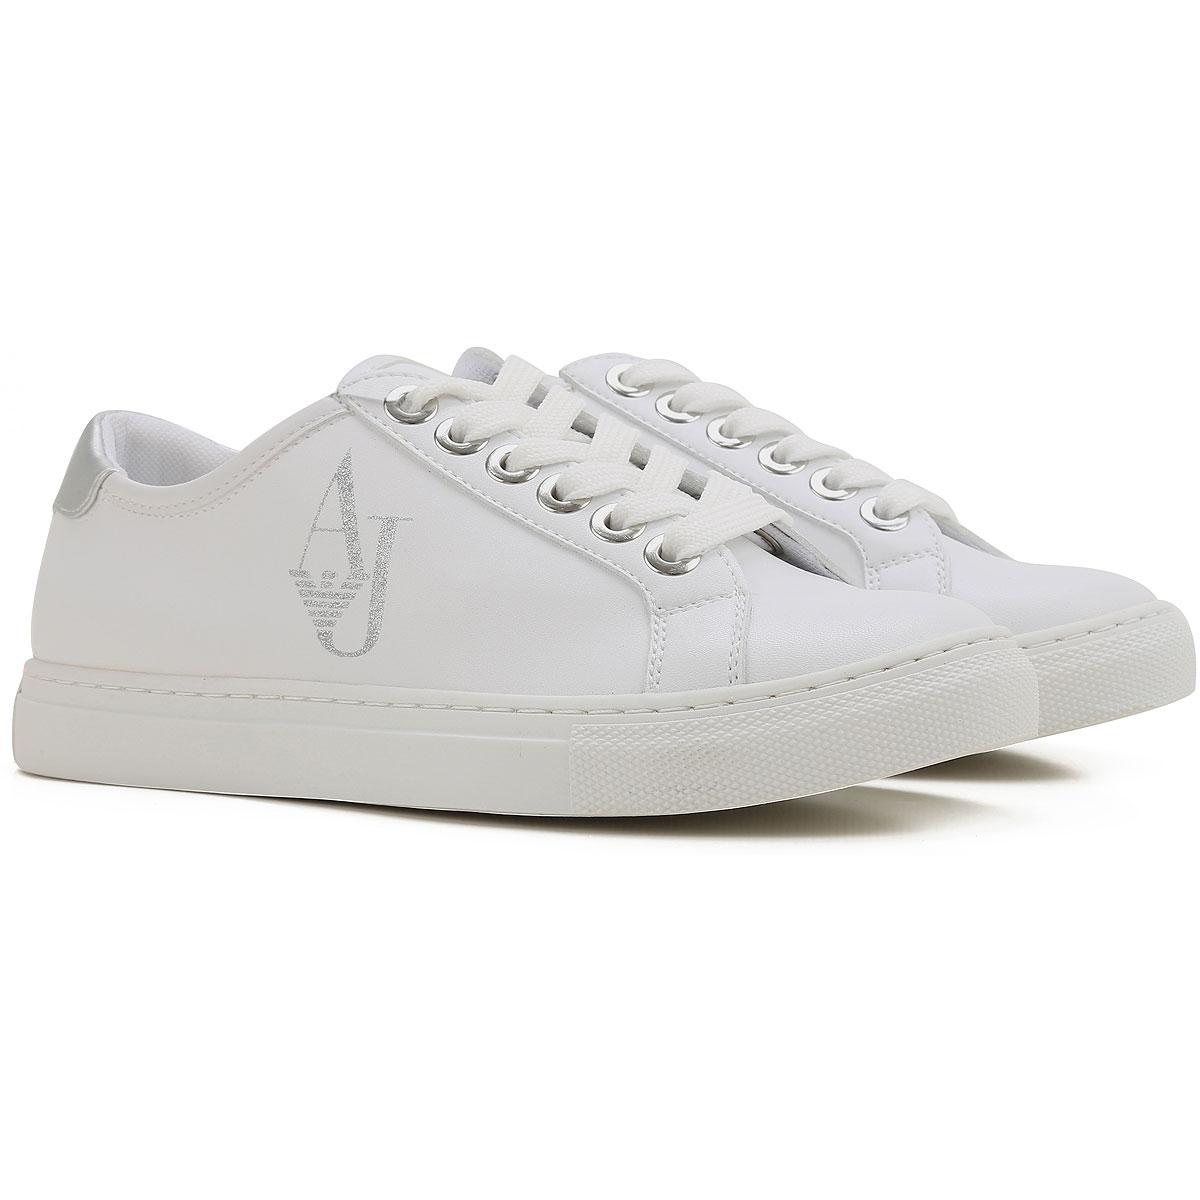 Womens Shoes Emporio Armani, Style code  925220-7p610-00010 fb4210cca7